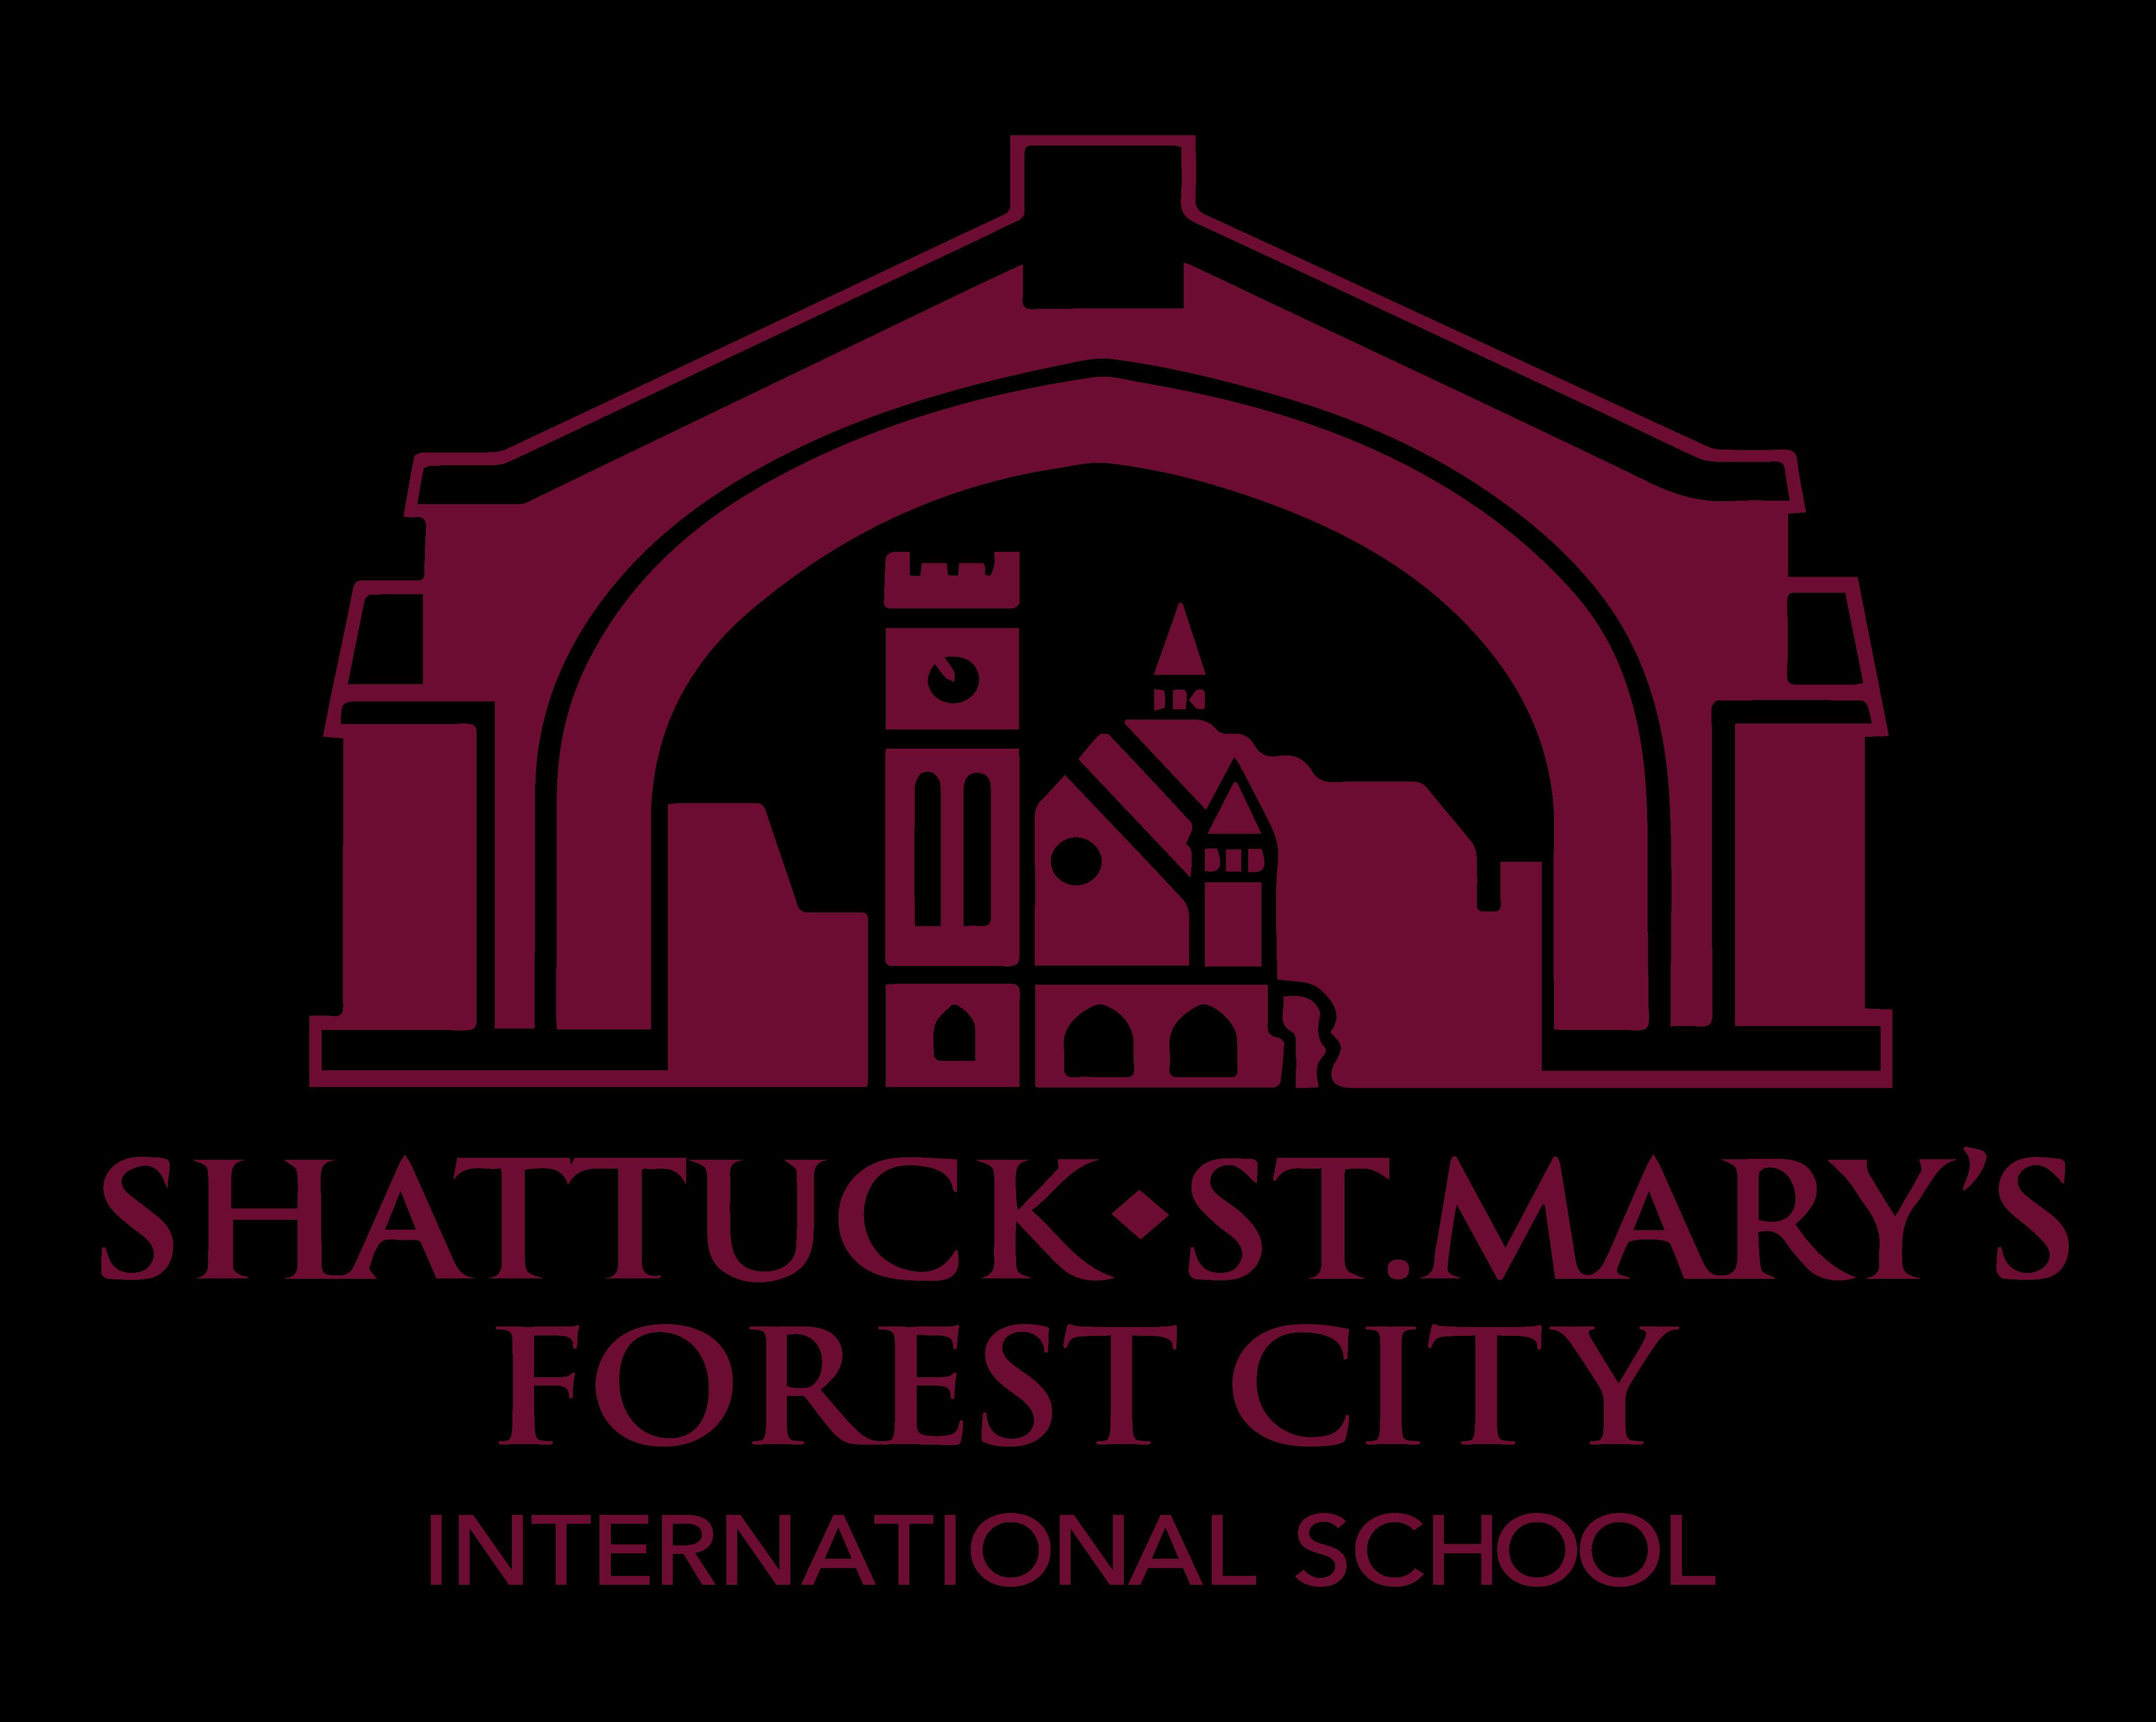 Shattuck St.Mary's Forest City International School